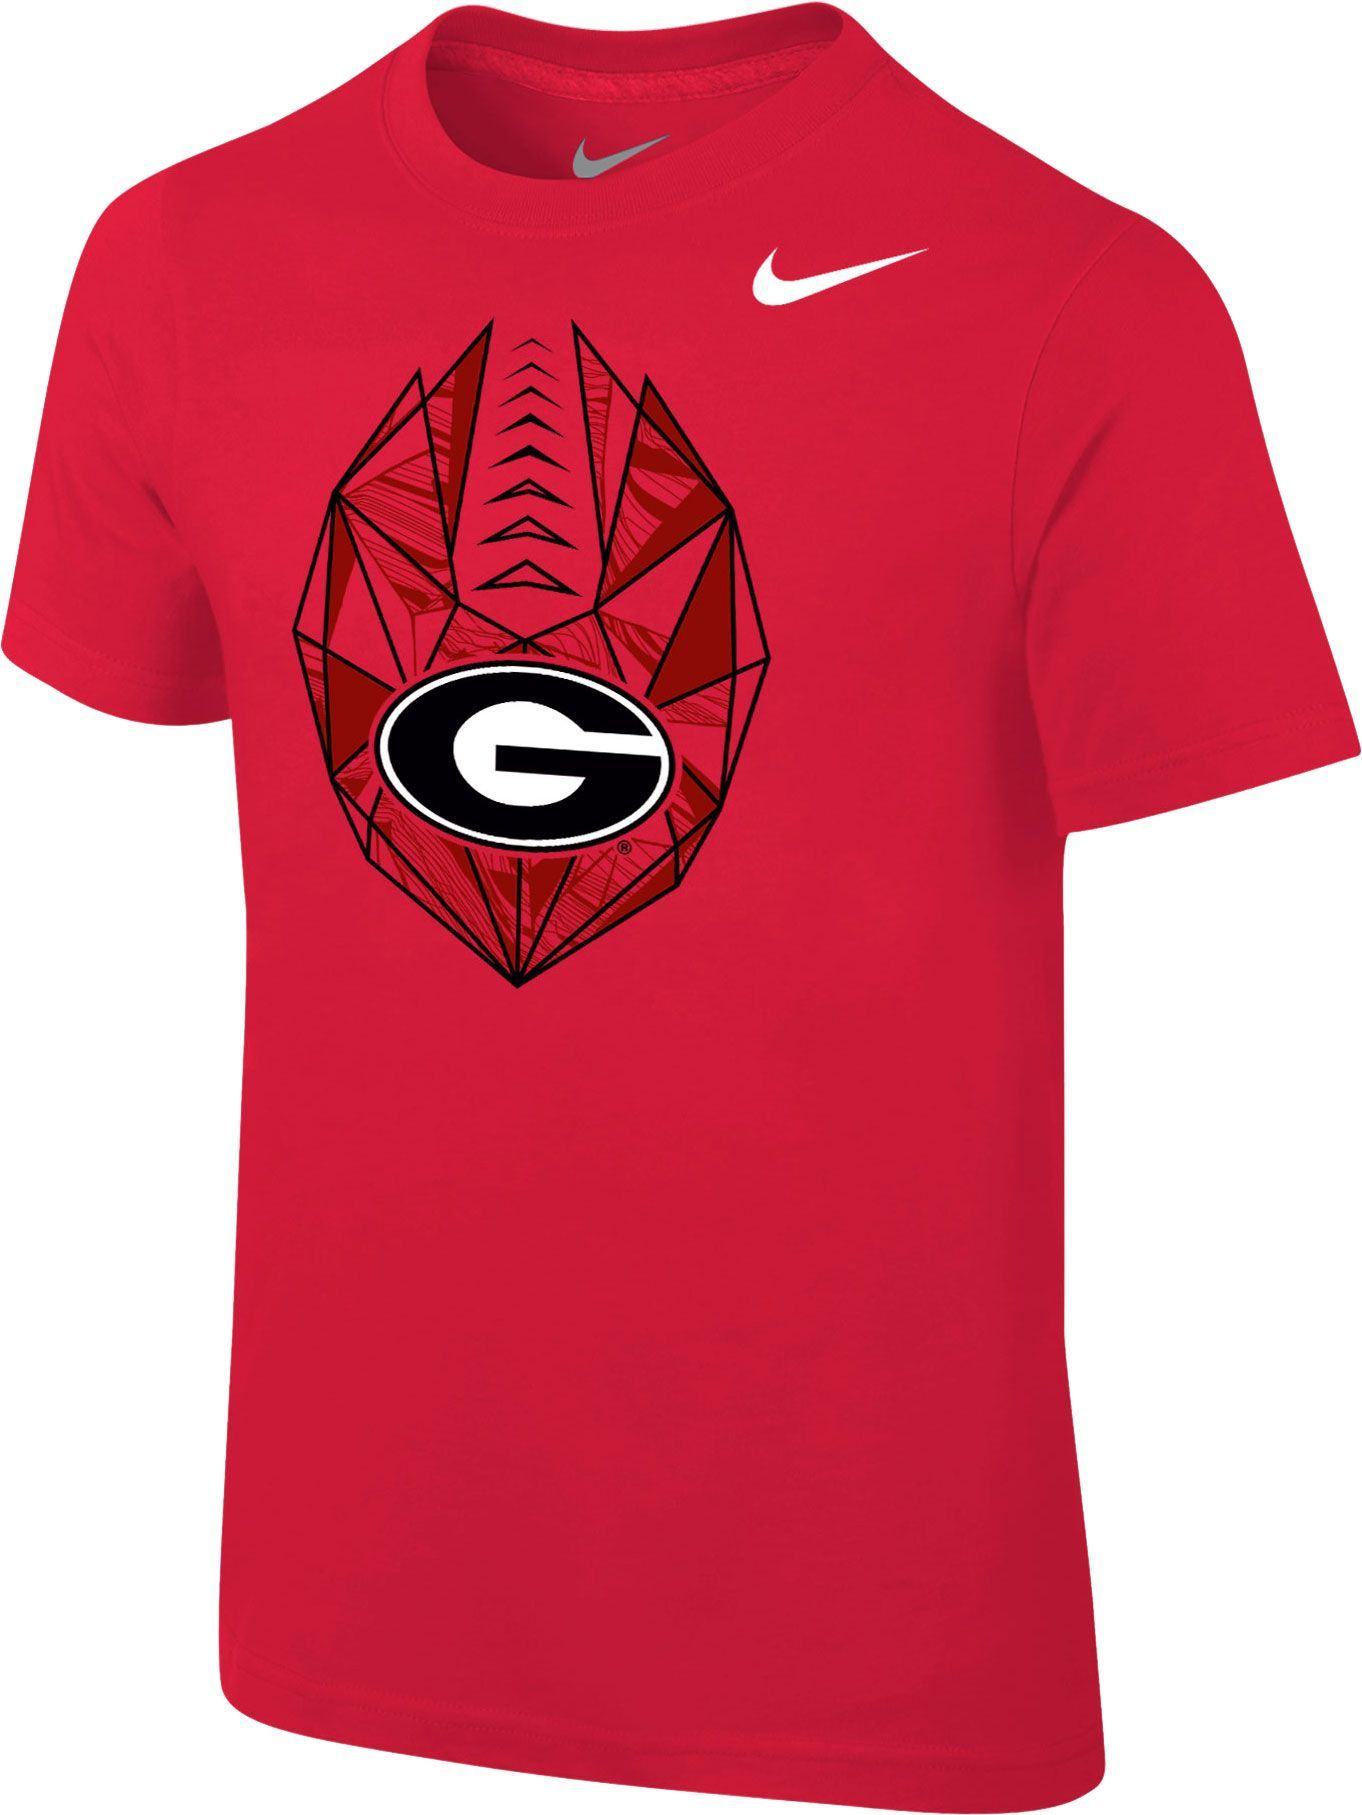 8586fdf46839 Nike Boys  Georgia Bulldogs Red Football Icon T-Shirt